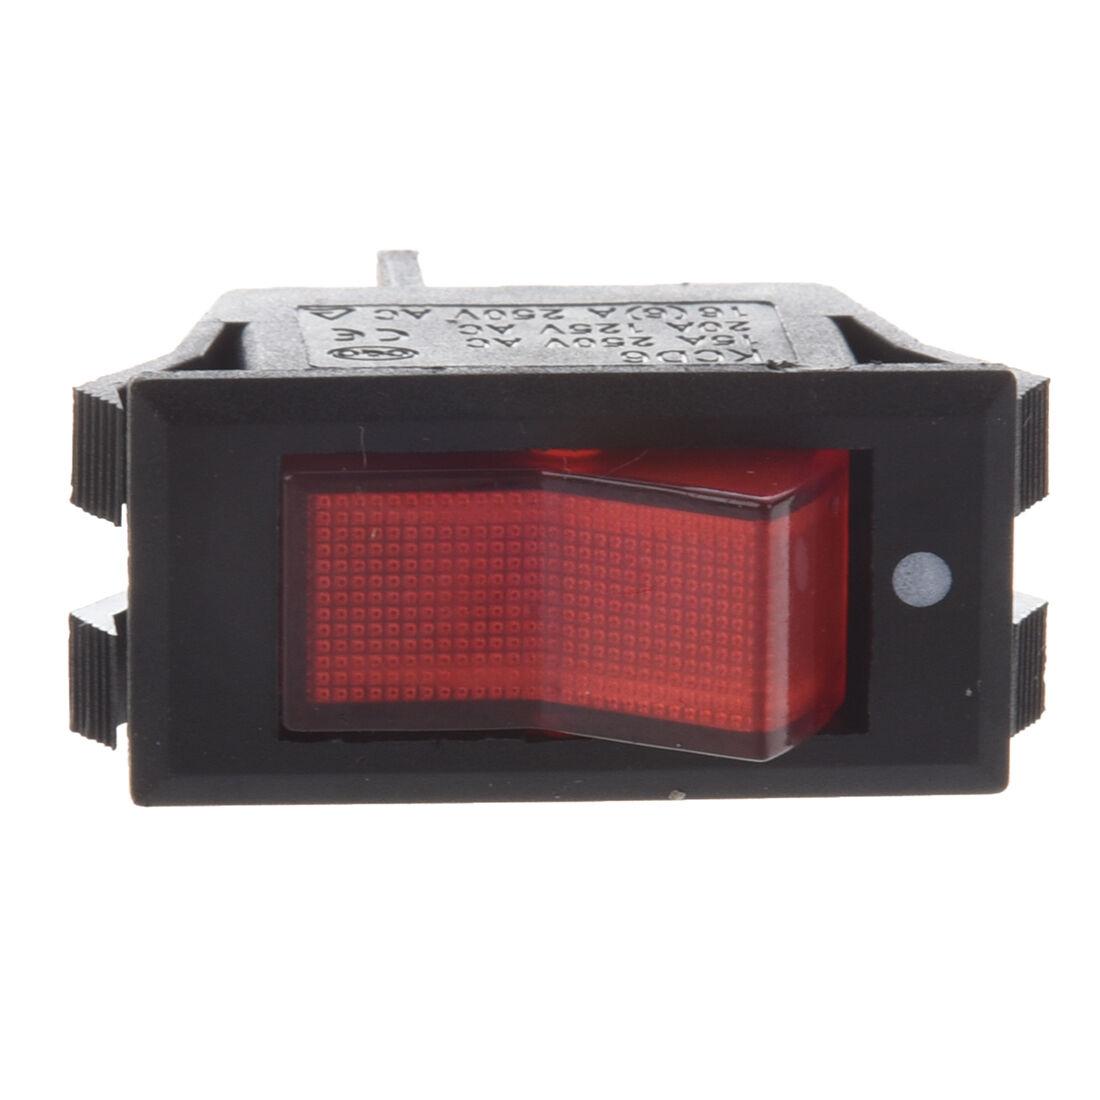 10x Red Neon Light Lamp On Off Spst Boat Rocker Switch 15a 250v 20a Round 3 Prong Blue Led Toggle 12v Ebay Stock Photo